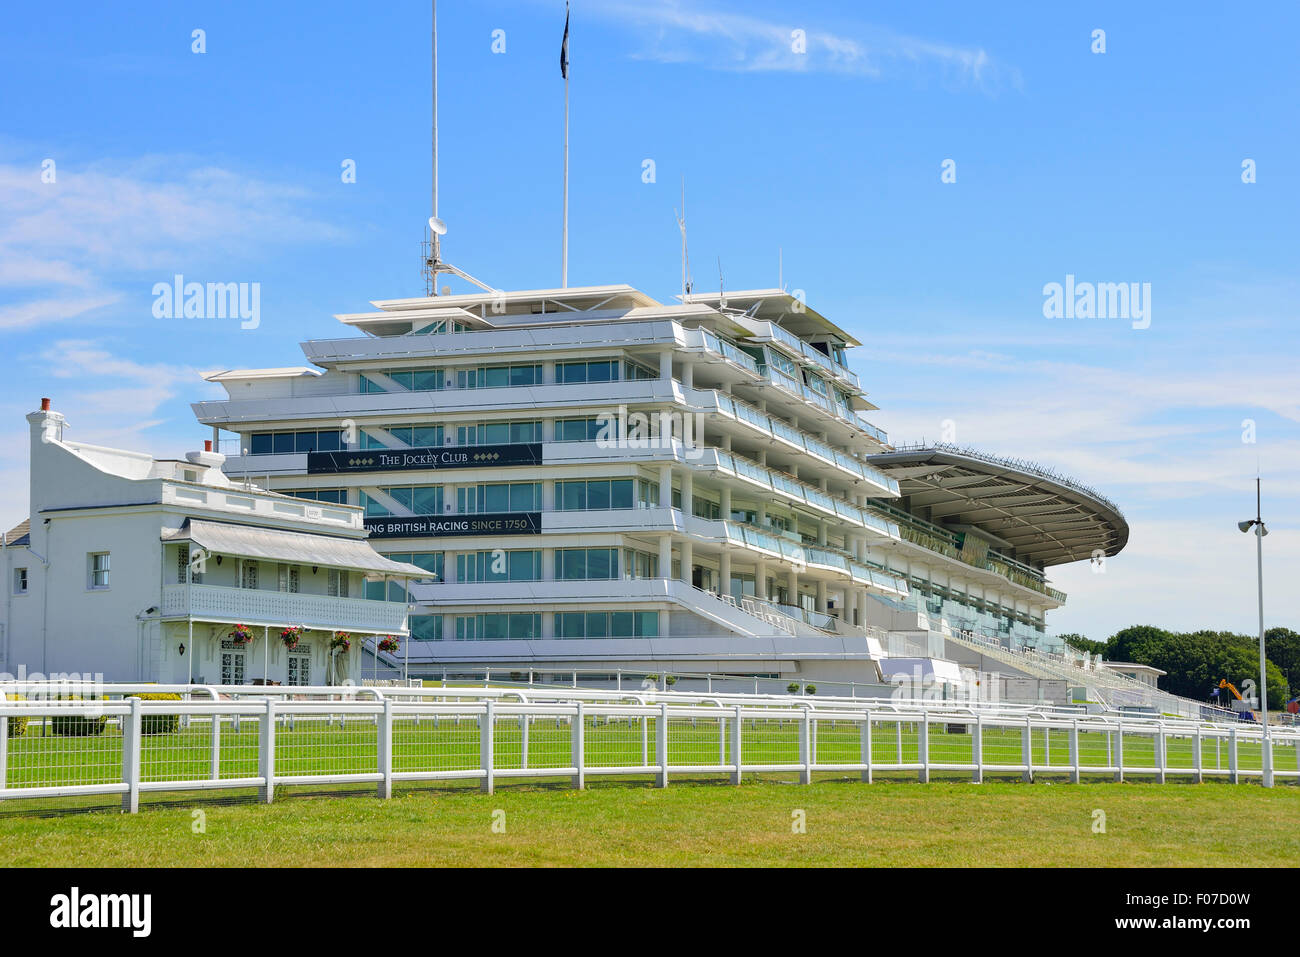 Epsom Downs Racecourse (Home of The Derby), Epsom Downs, Epsom, Surrey, England, United Kingdom - Stock Image